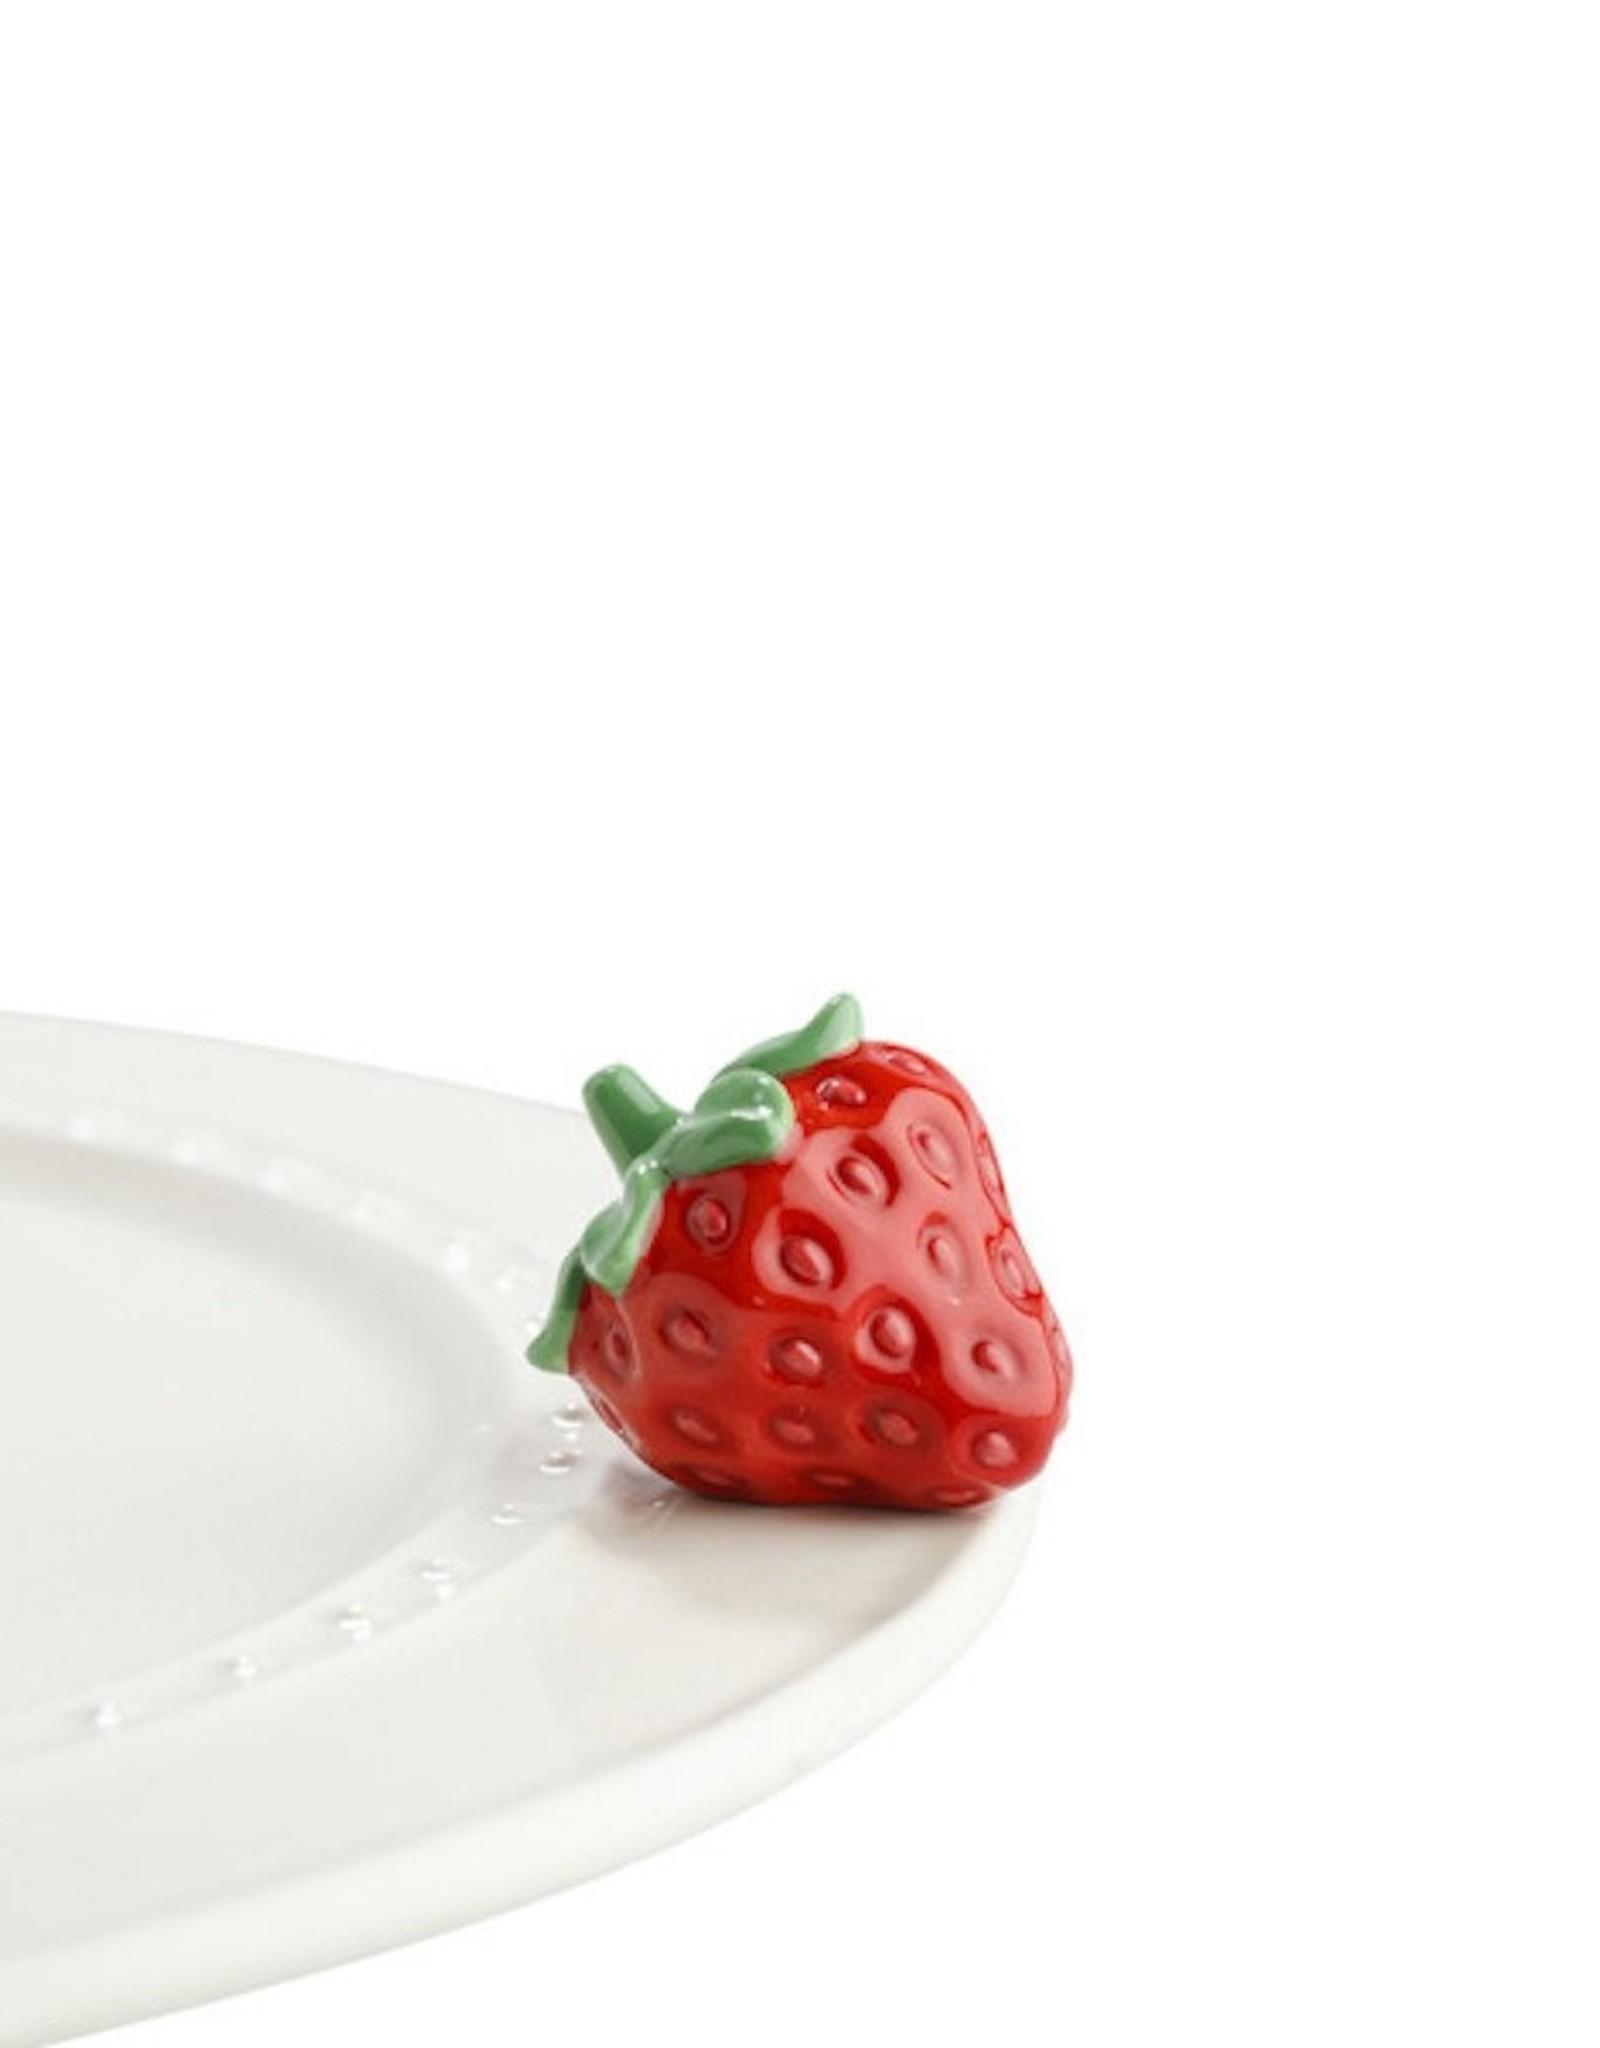 Nora Fleming Juicy Fruit Strawberry, mini